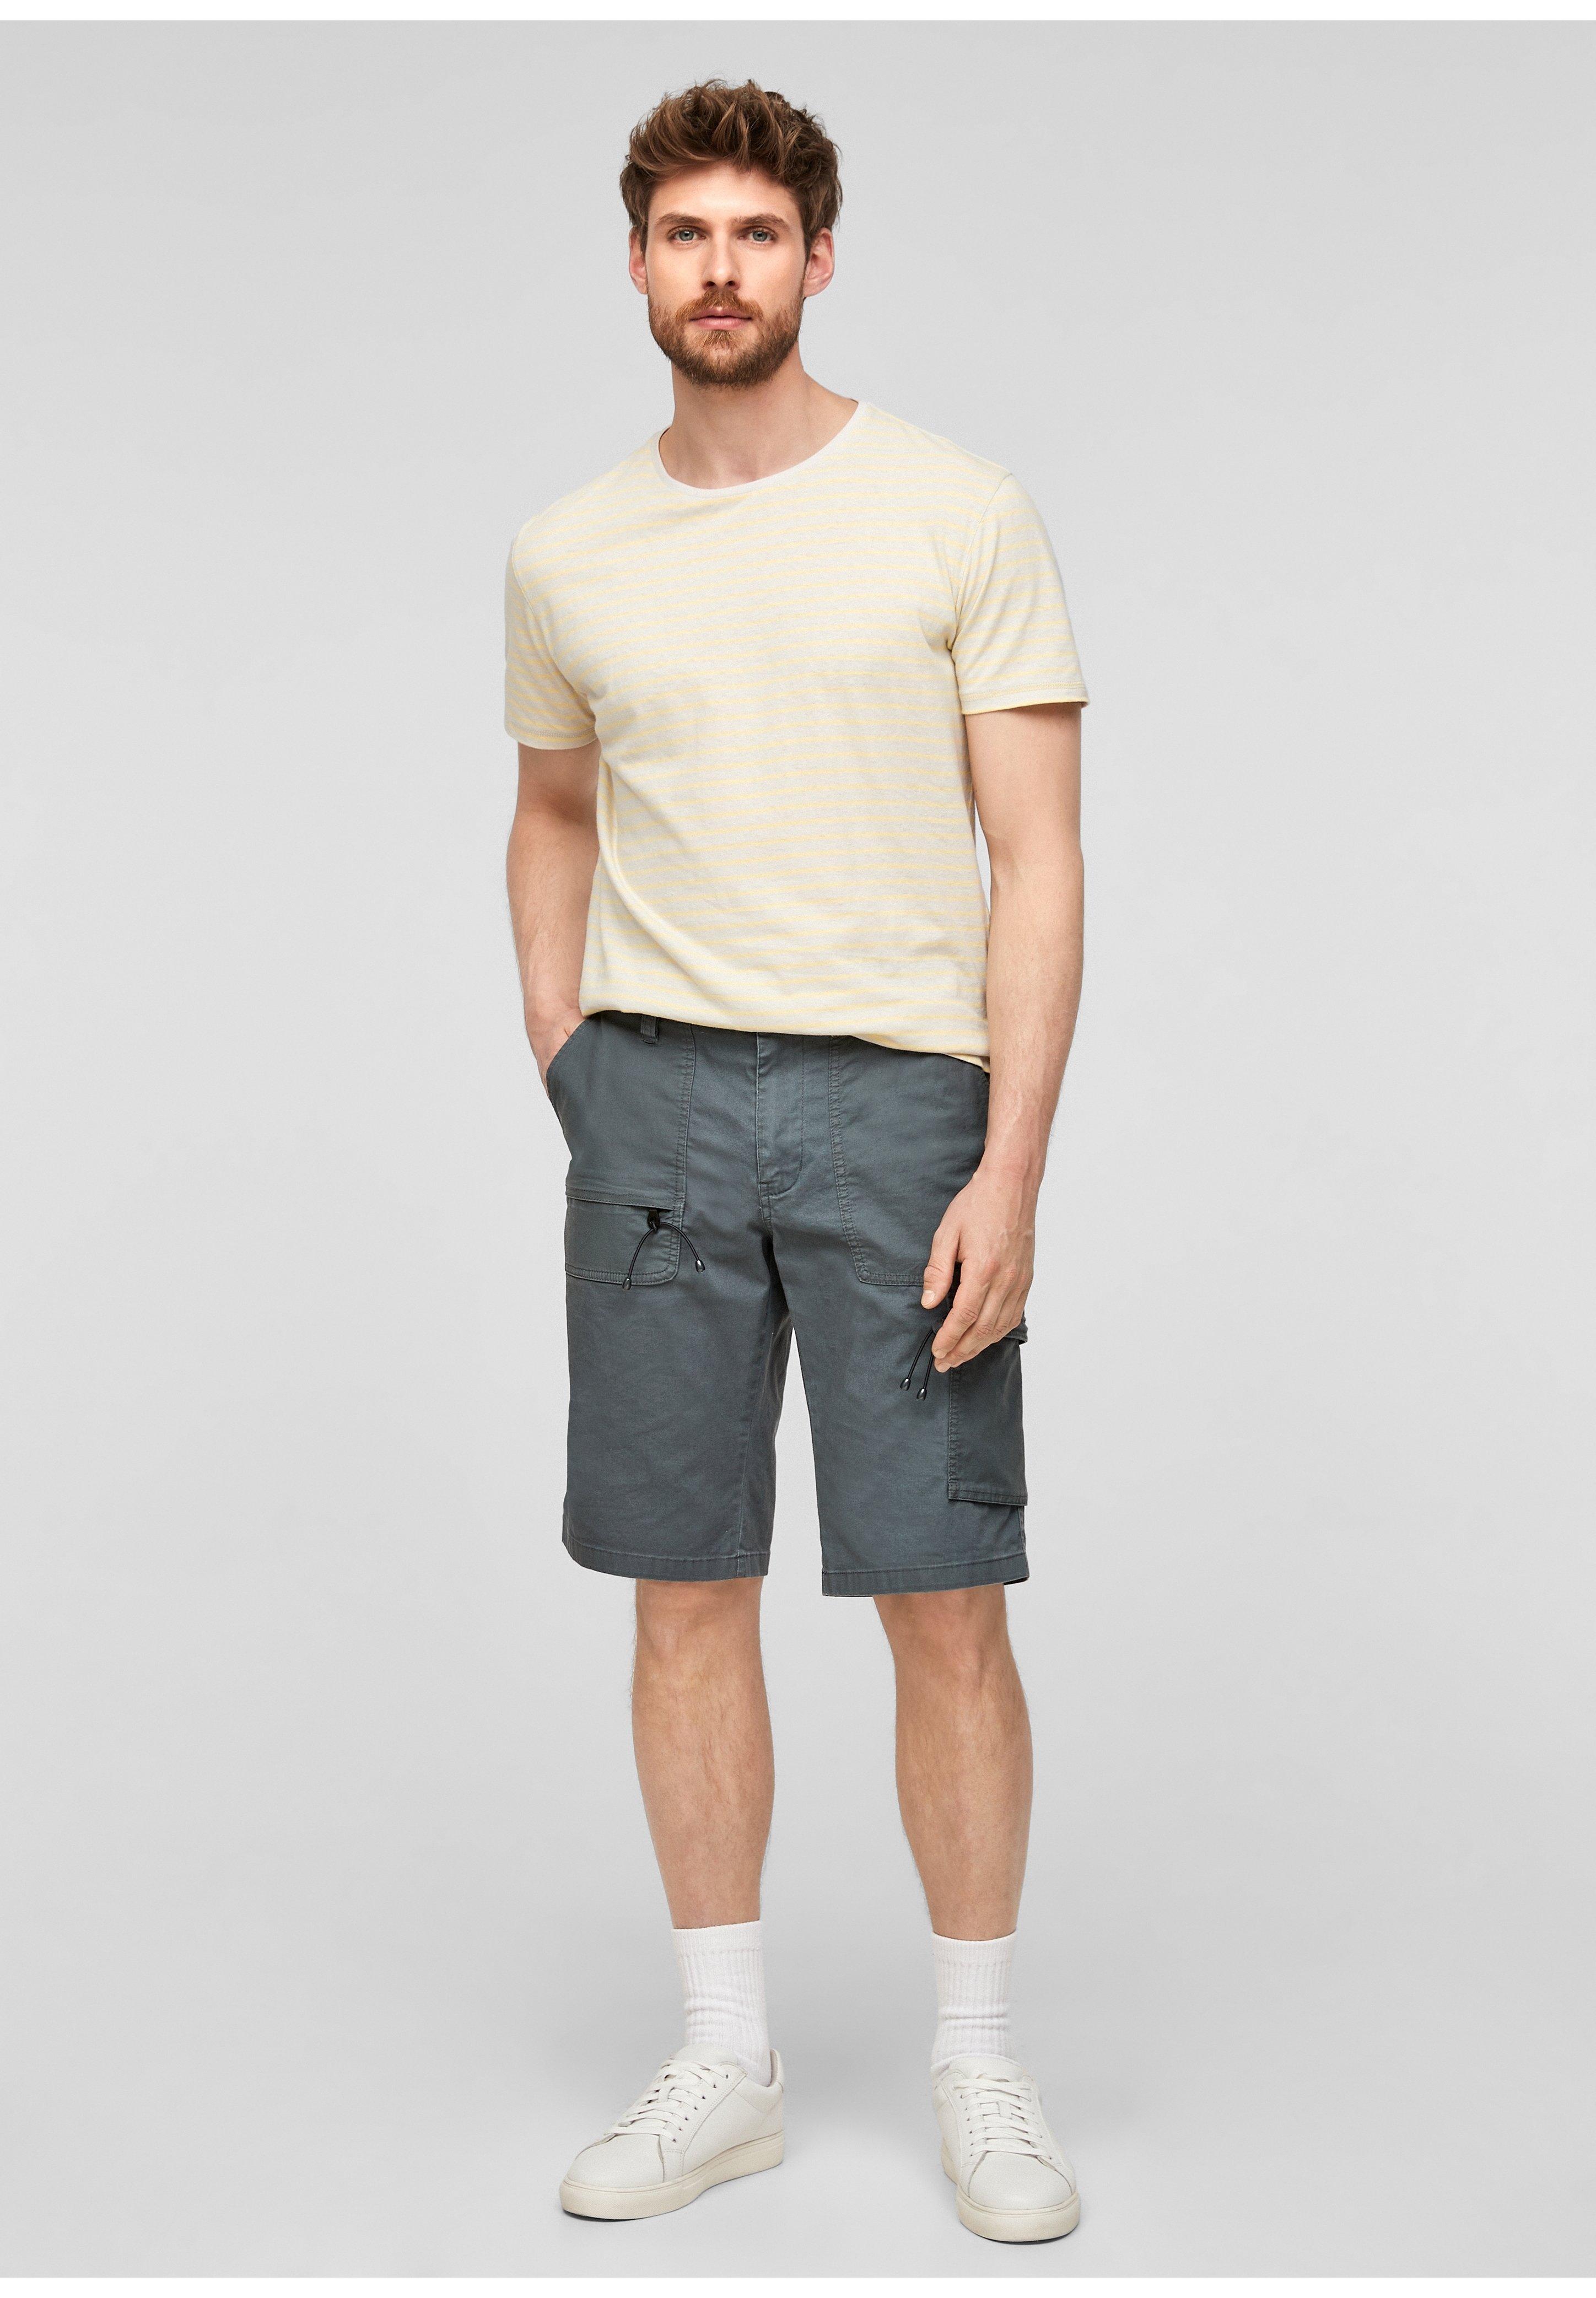 Homme REGULAR FIT  - Pantalon cargo